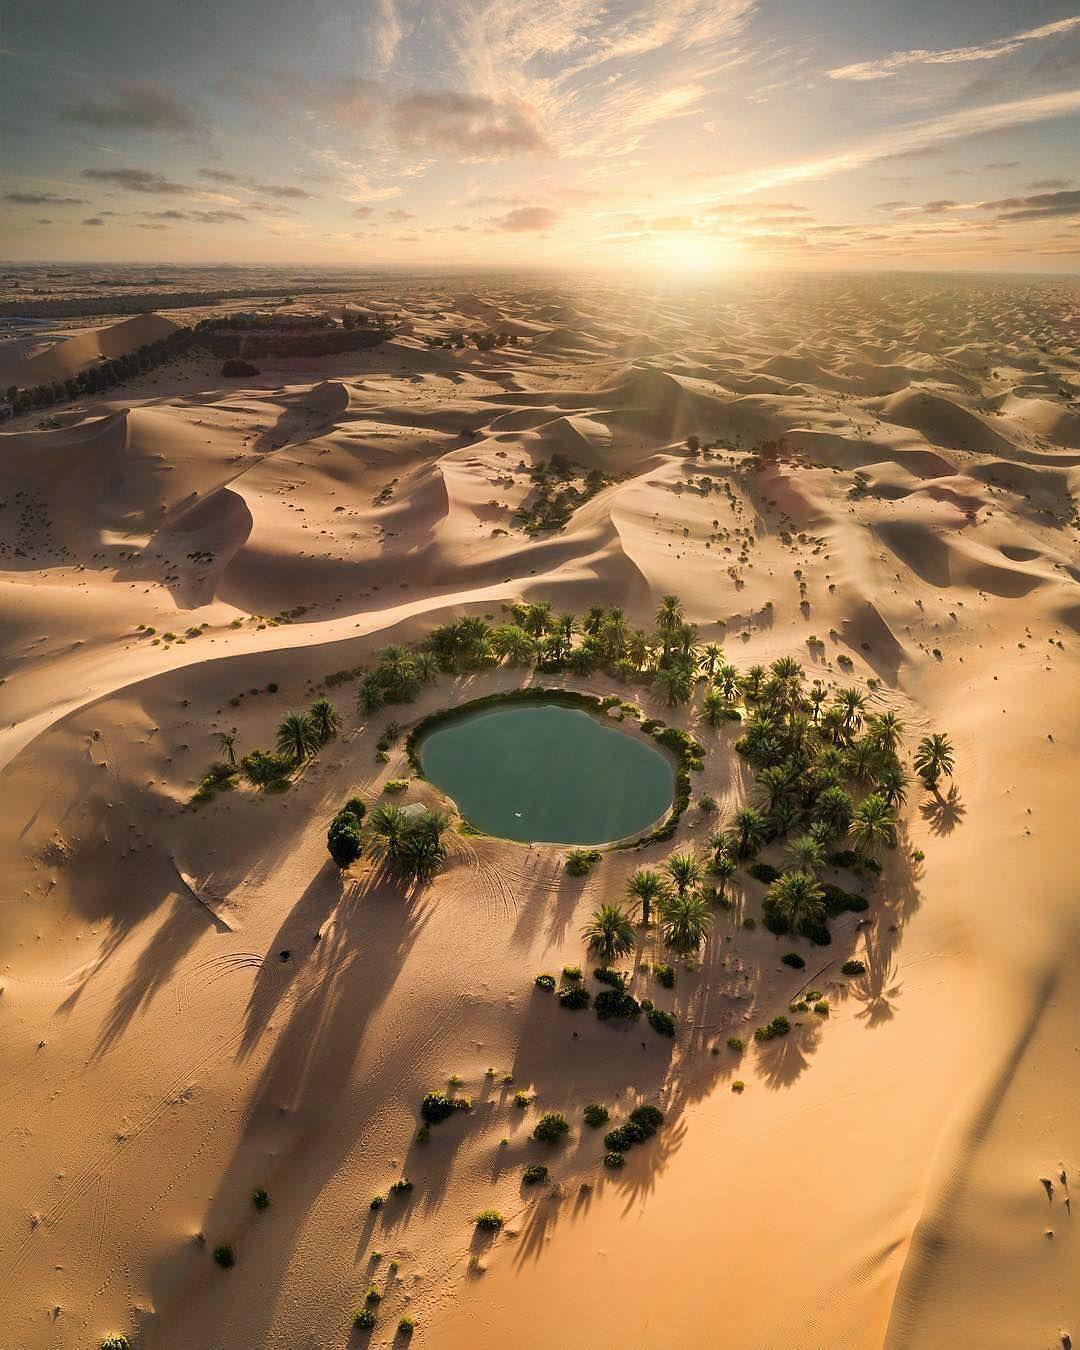 L Helgoualc H On Instagram Oasis Near Alain Abudhabi Uae Photography Contemporaryart Art Desert Amazing Stunn Deserts Of The World Siwa Oasis Oasis Oasis